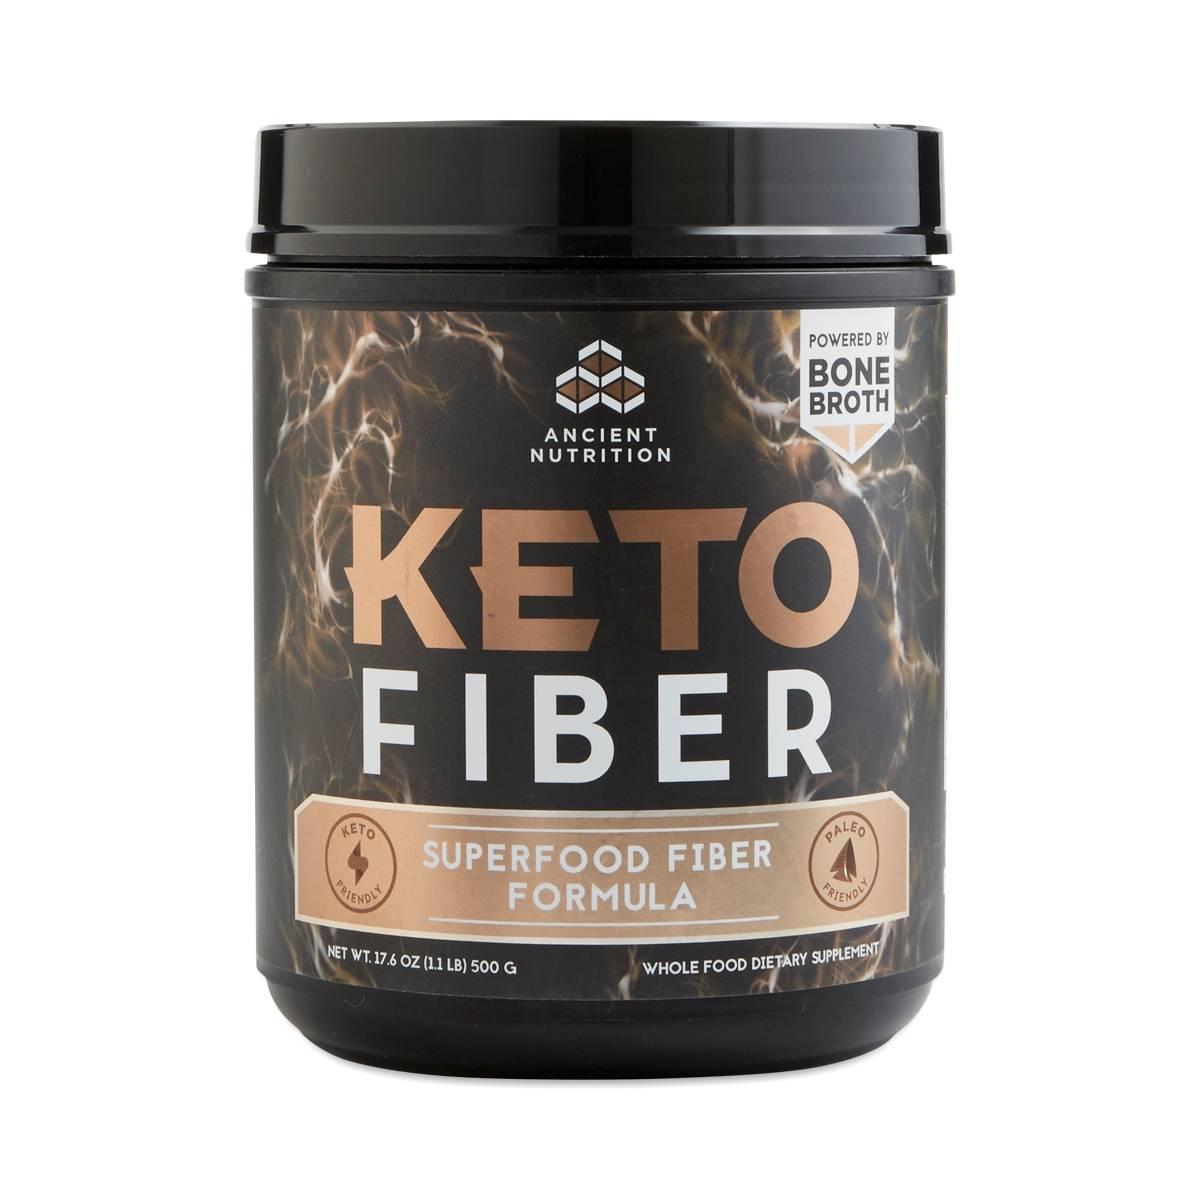 Keto FIBER Superfood Fiber Formula by Ancient Nutrition ...